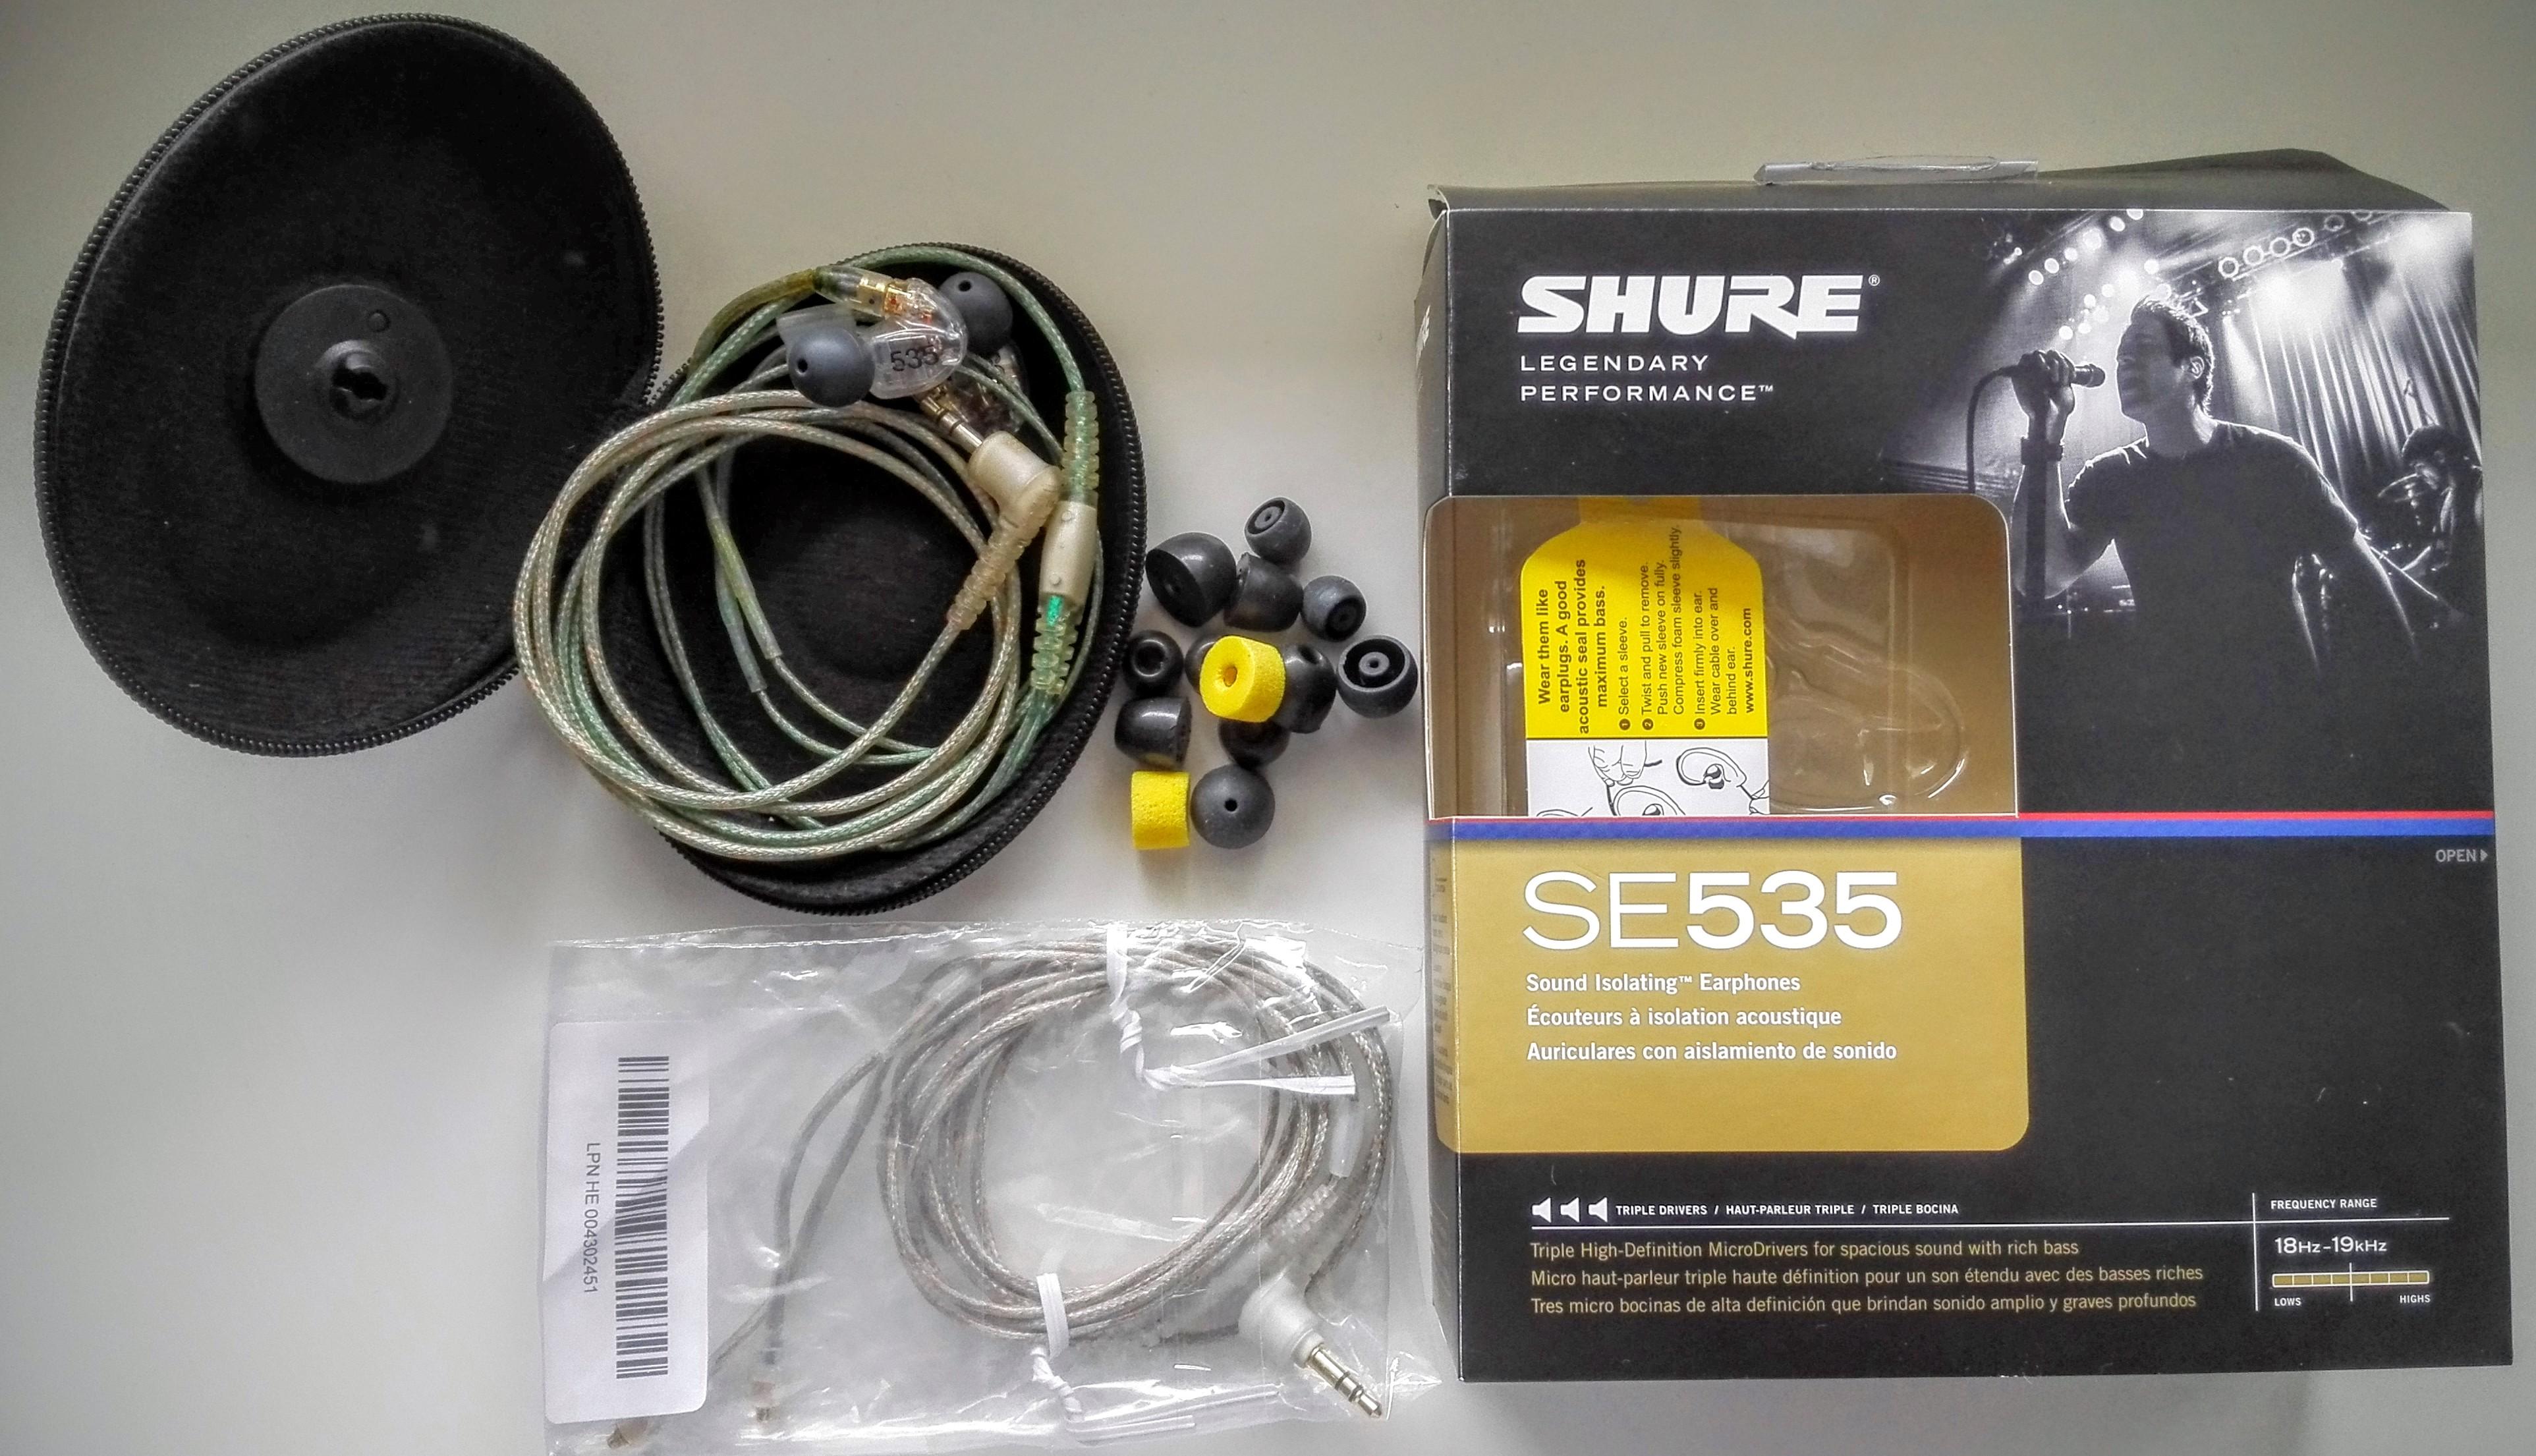 shure se 535 casque ear monitor champagne ardenne audiofanzine. Black Bedroom Furniture Sets. Home Design Ideas